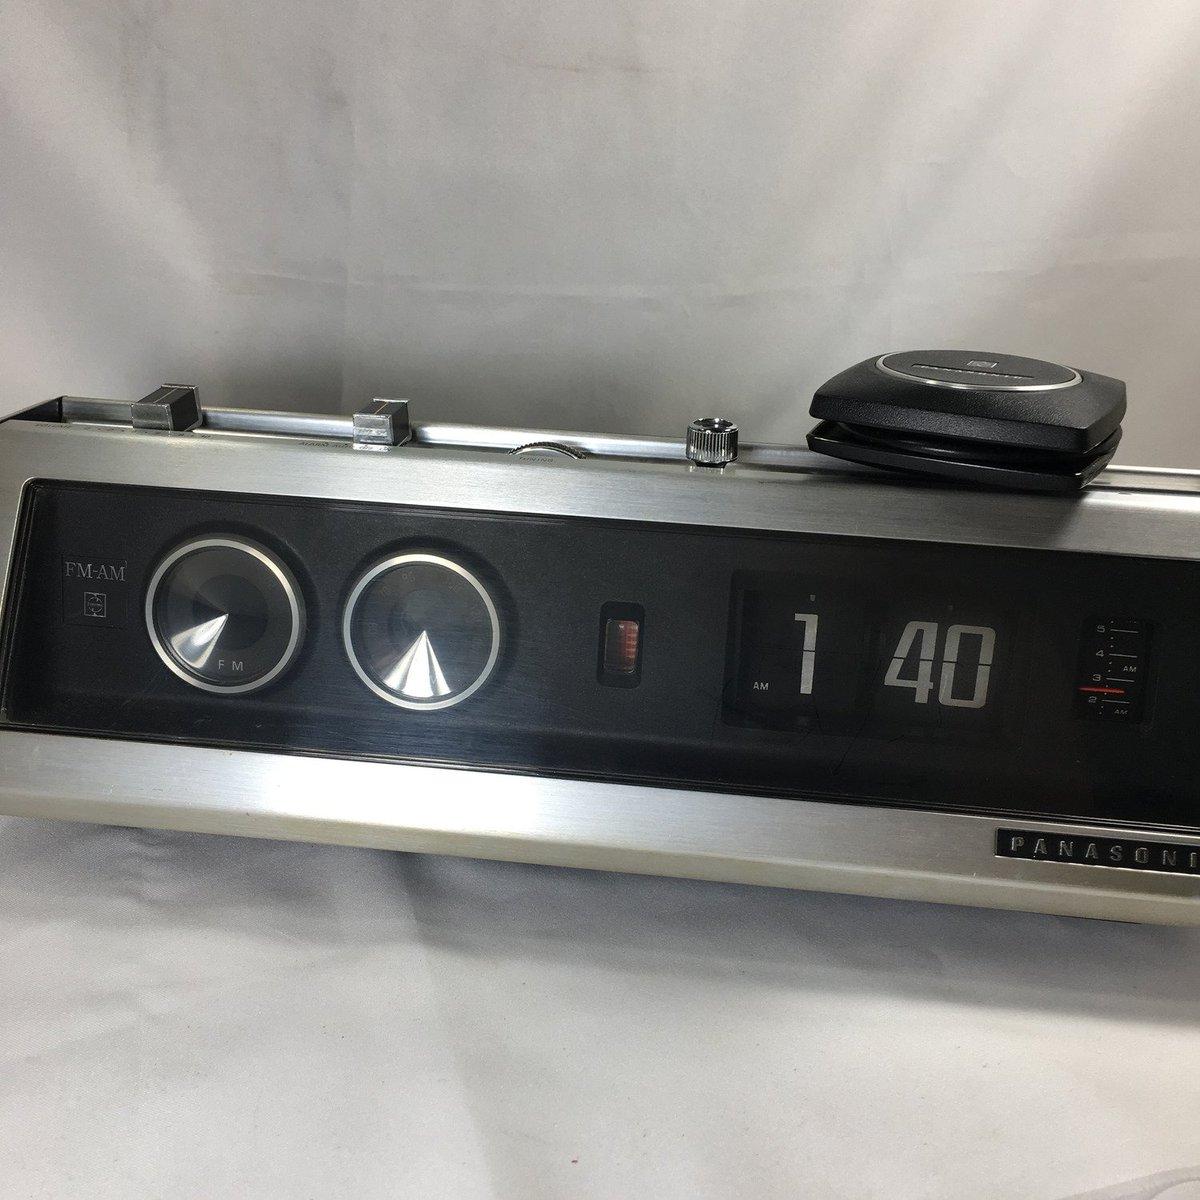 1970's Panasonic RC-7589 FM-AM Flip Clock Radio with Pillow Speaker   https://www.ebay.com/itm/253911422804…  #panasonic #vintage #flipclock #pillowspeaker #AMFM #vintageclock #clock #style #time #flipclocks #spaceage #flip #retro #ebayROCteampic.twitter.com/PgjEsr6ZYx